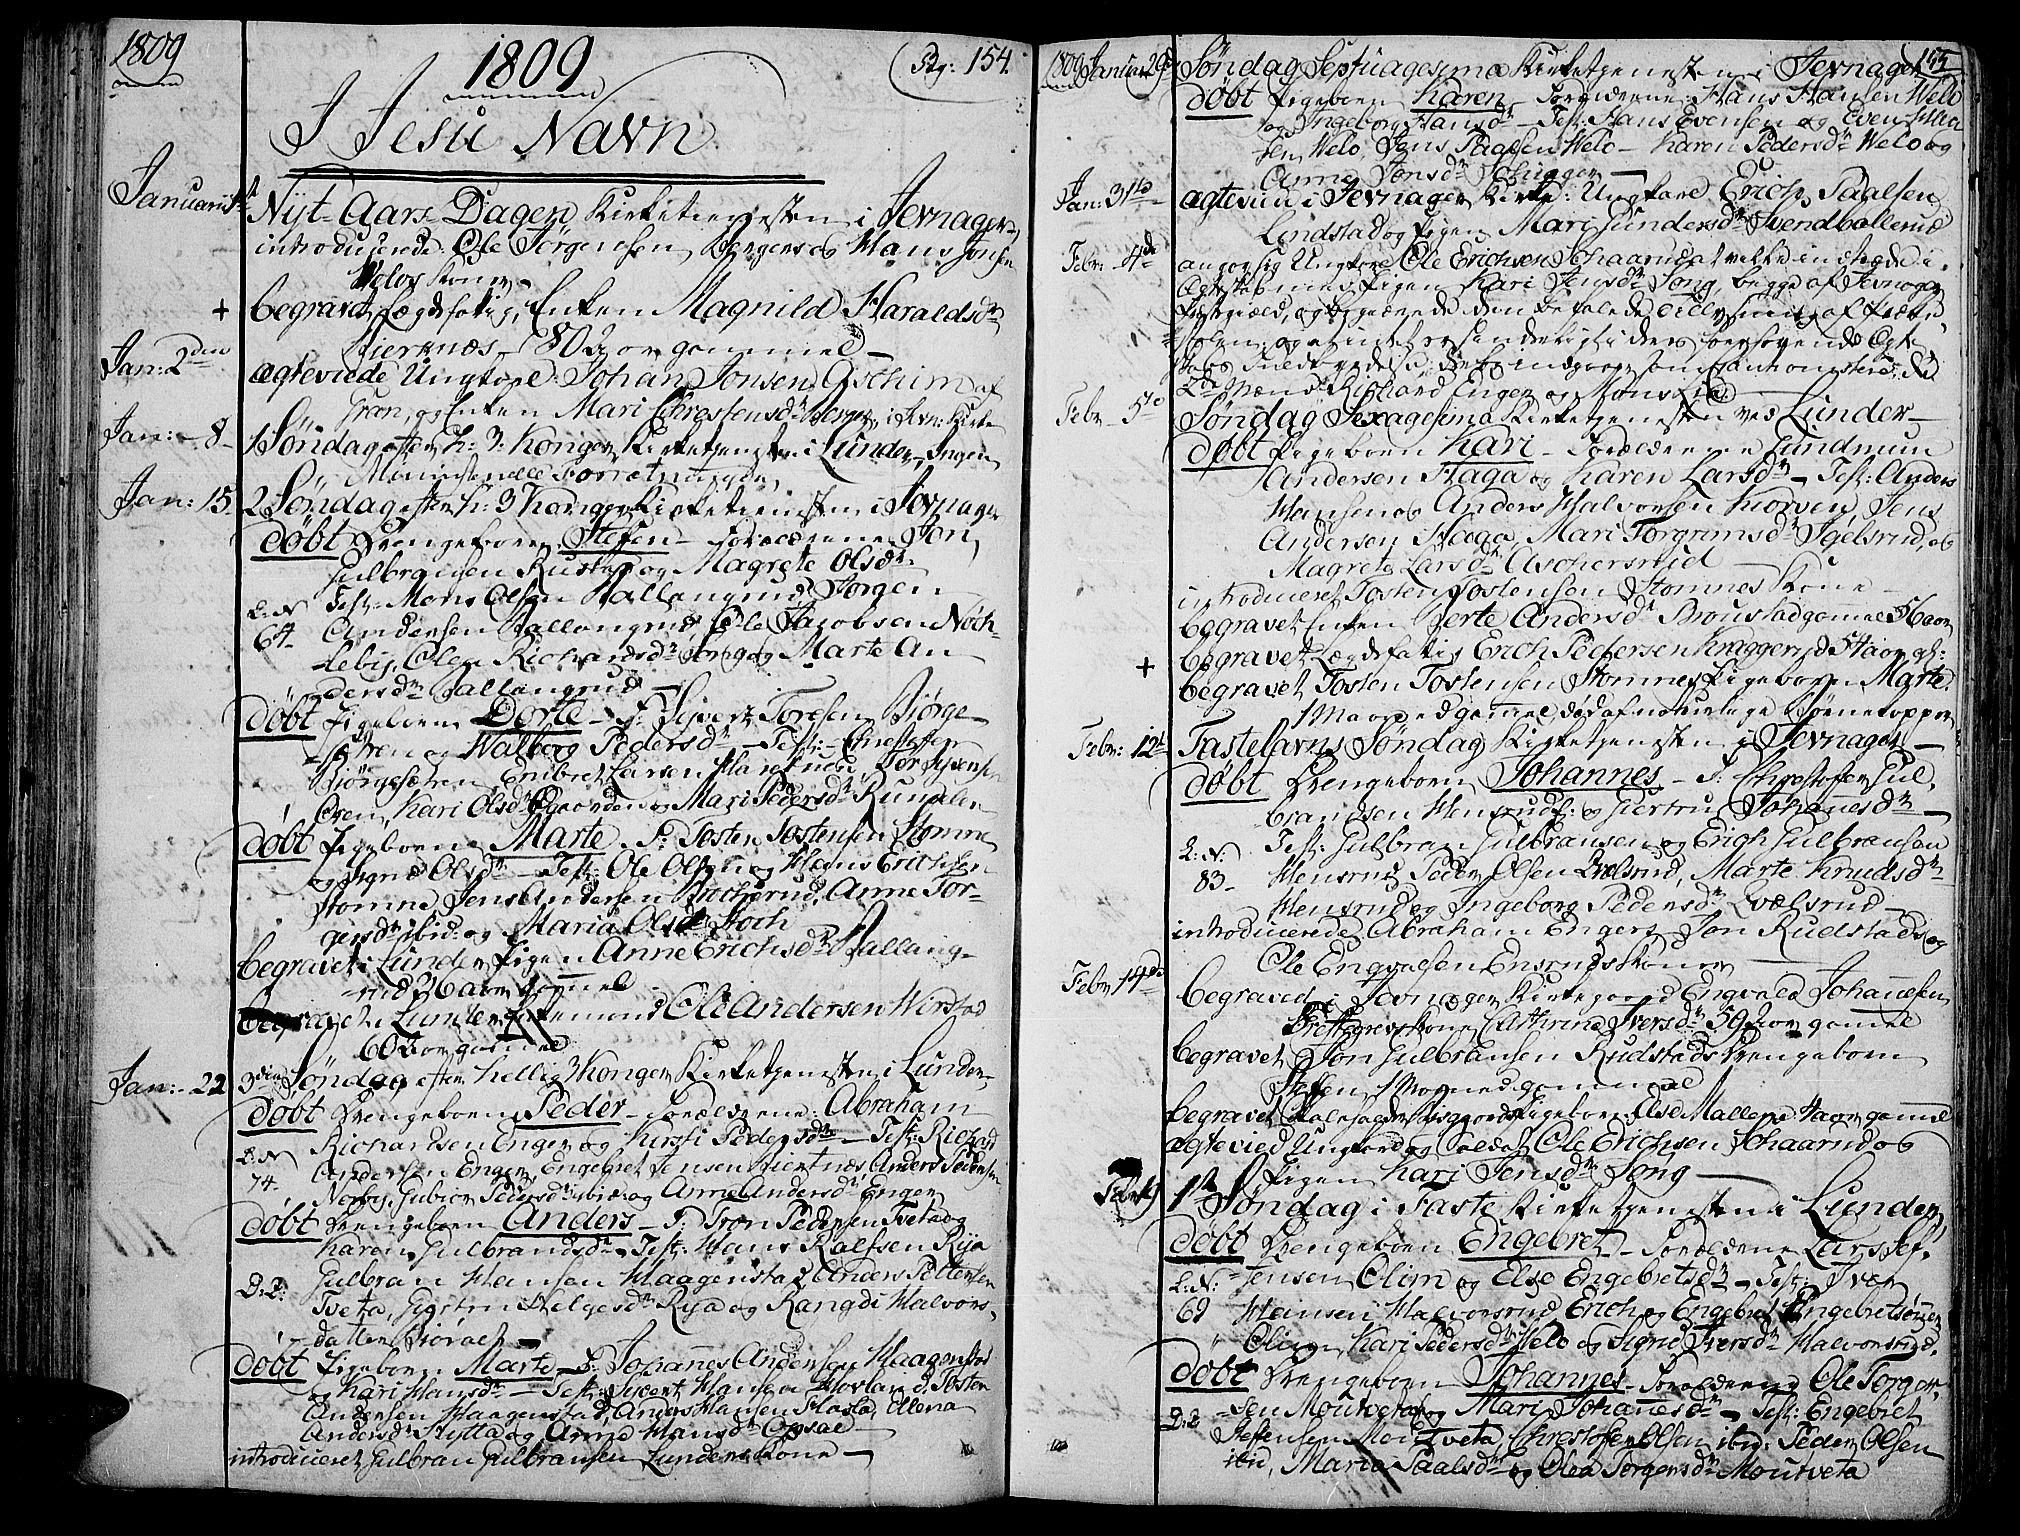 SAH, Jevnaker prestekontor, Ministerialbok nr. 4, 1800-1861, s. 154-155